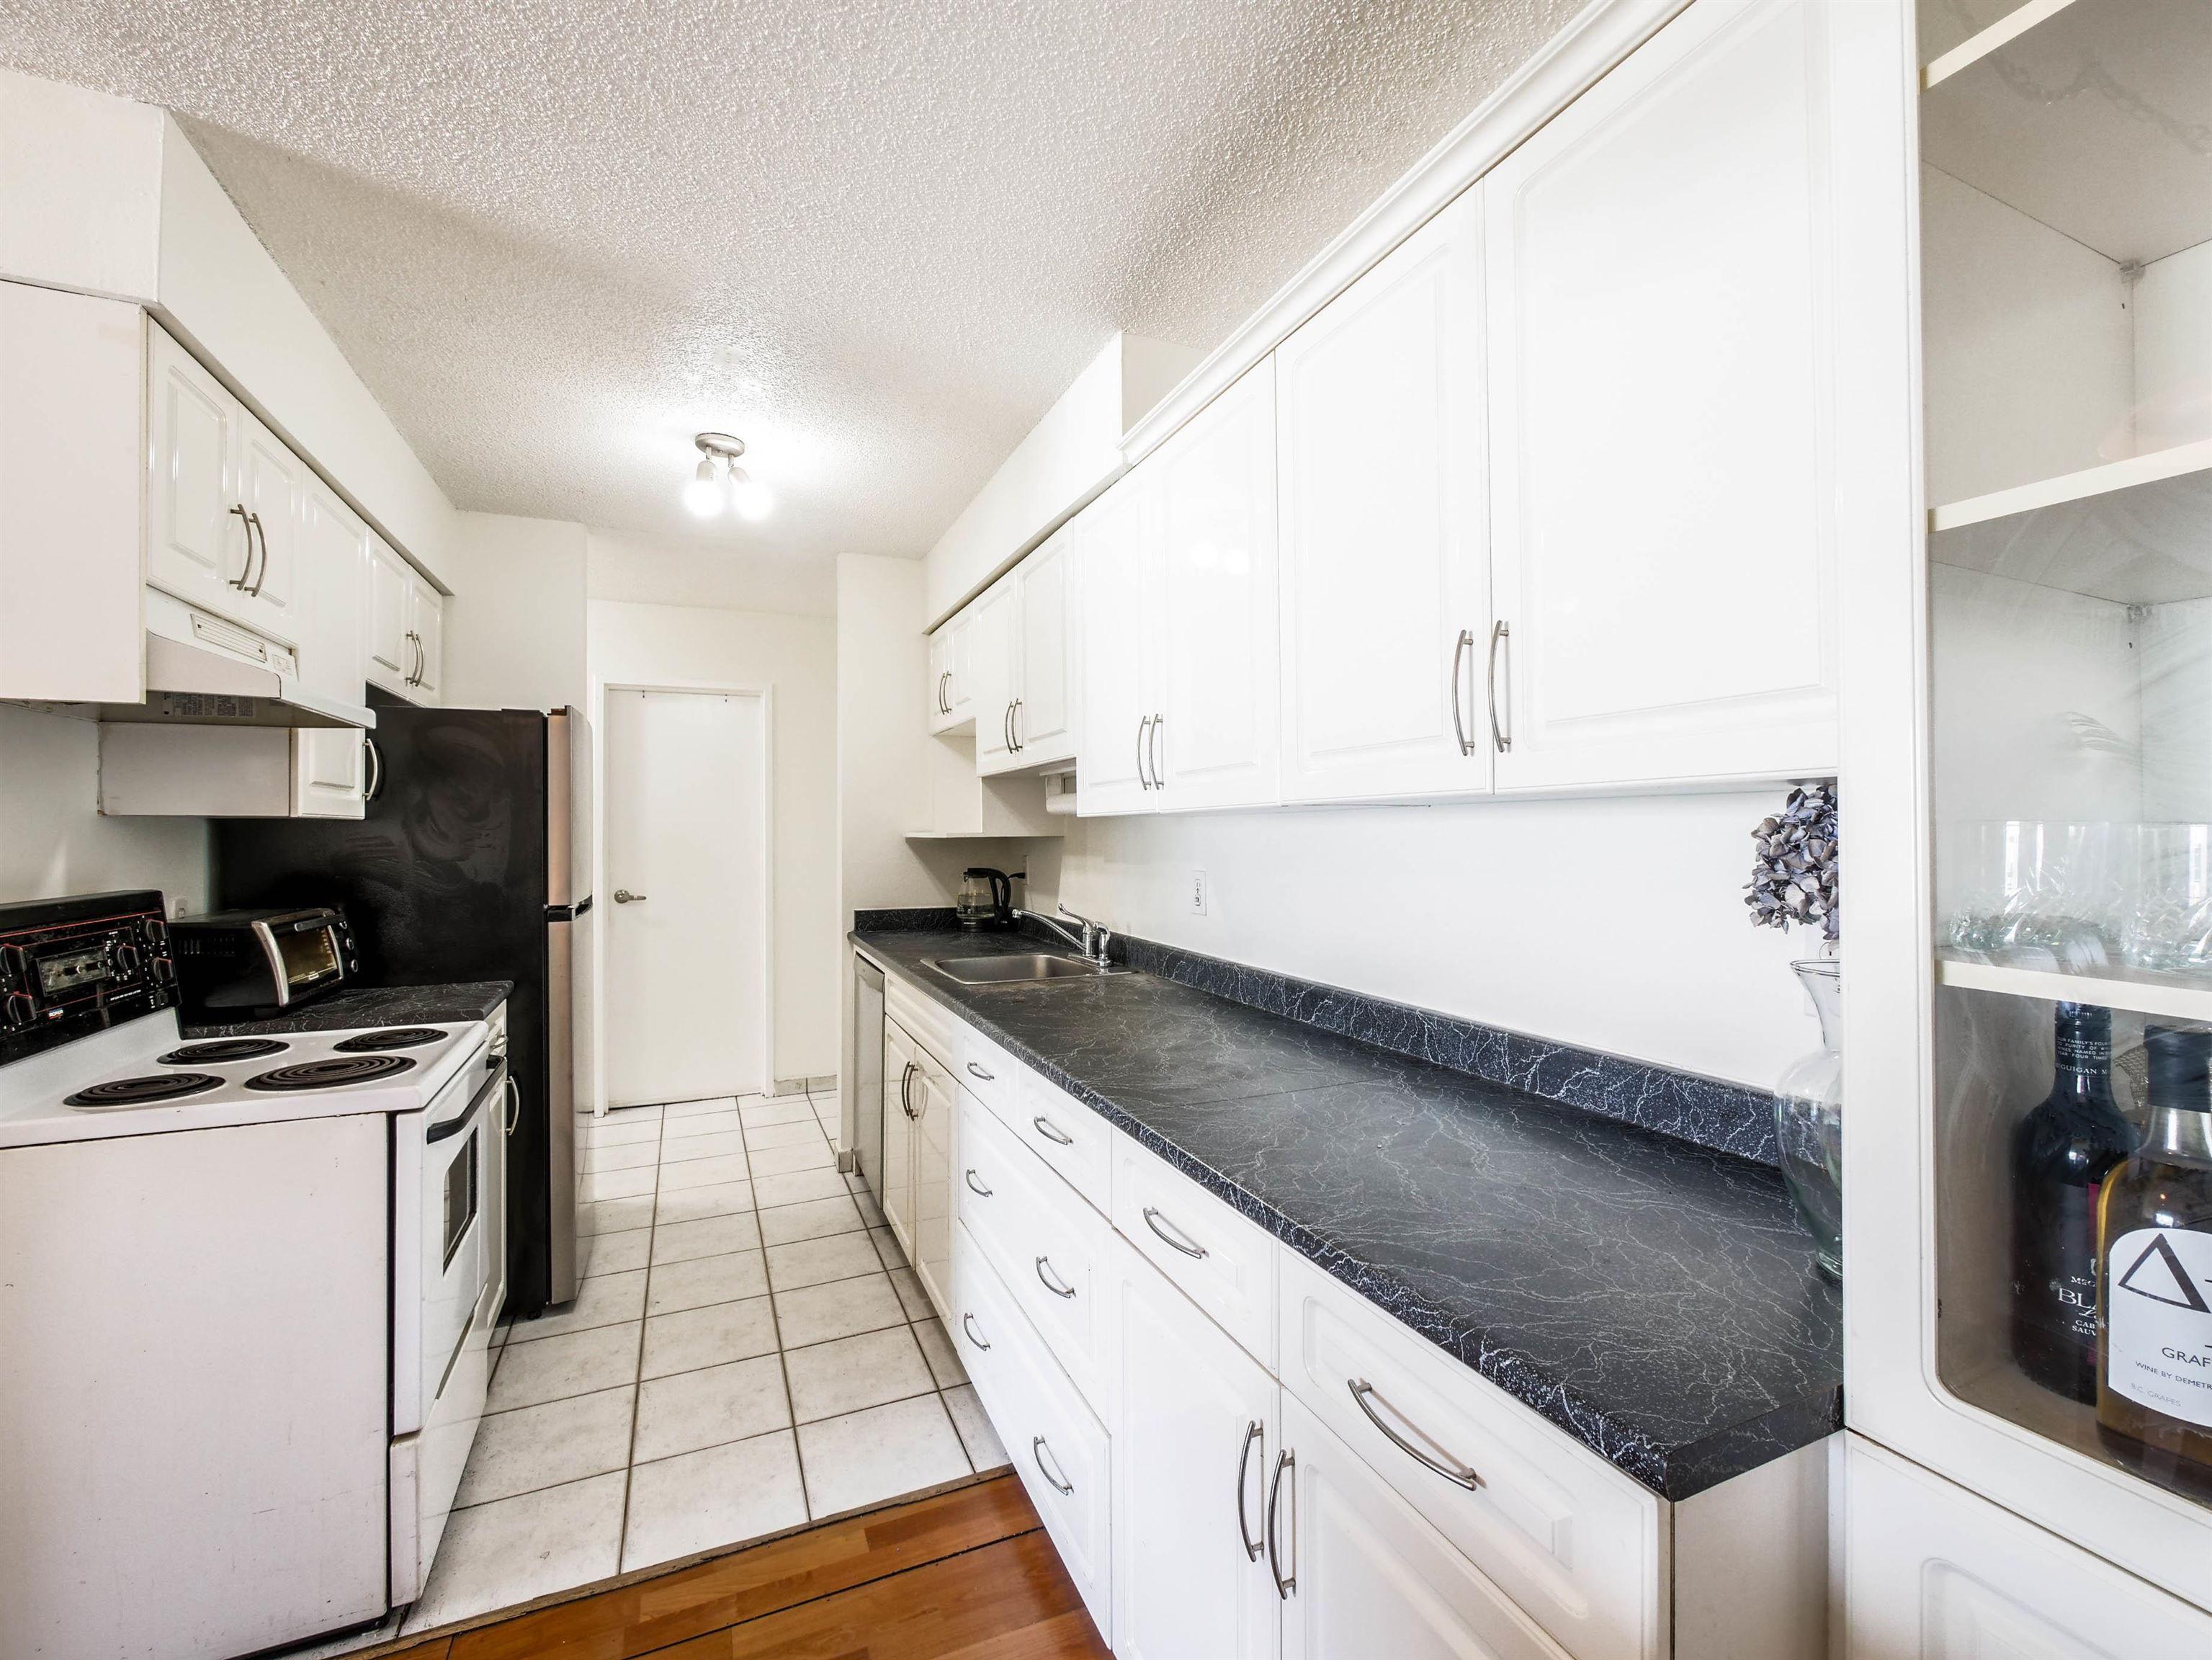 "Main Photo: 312 2450 CORNWALL Avenue in Vancouver: Kitsilano Condo for sale in ""THE OCEAN'S DOOR"" (Vancouver West)  : MLS®# R2620962"